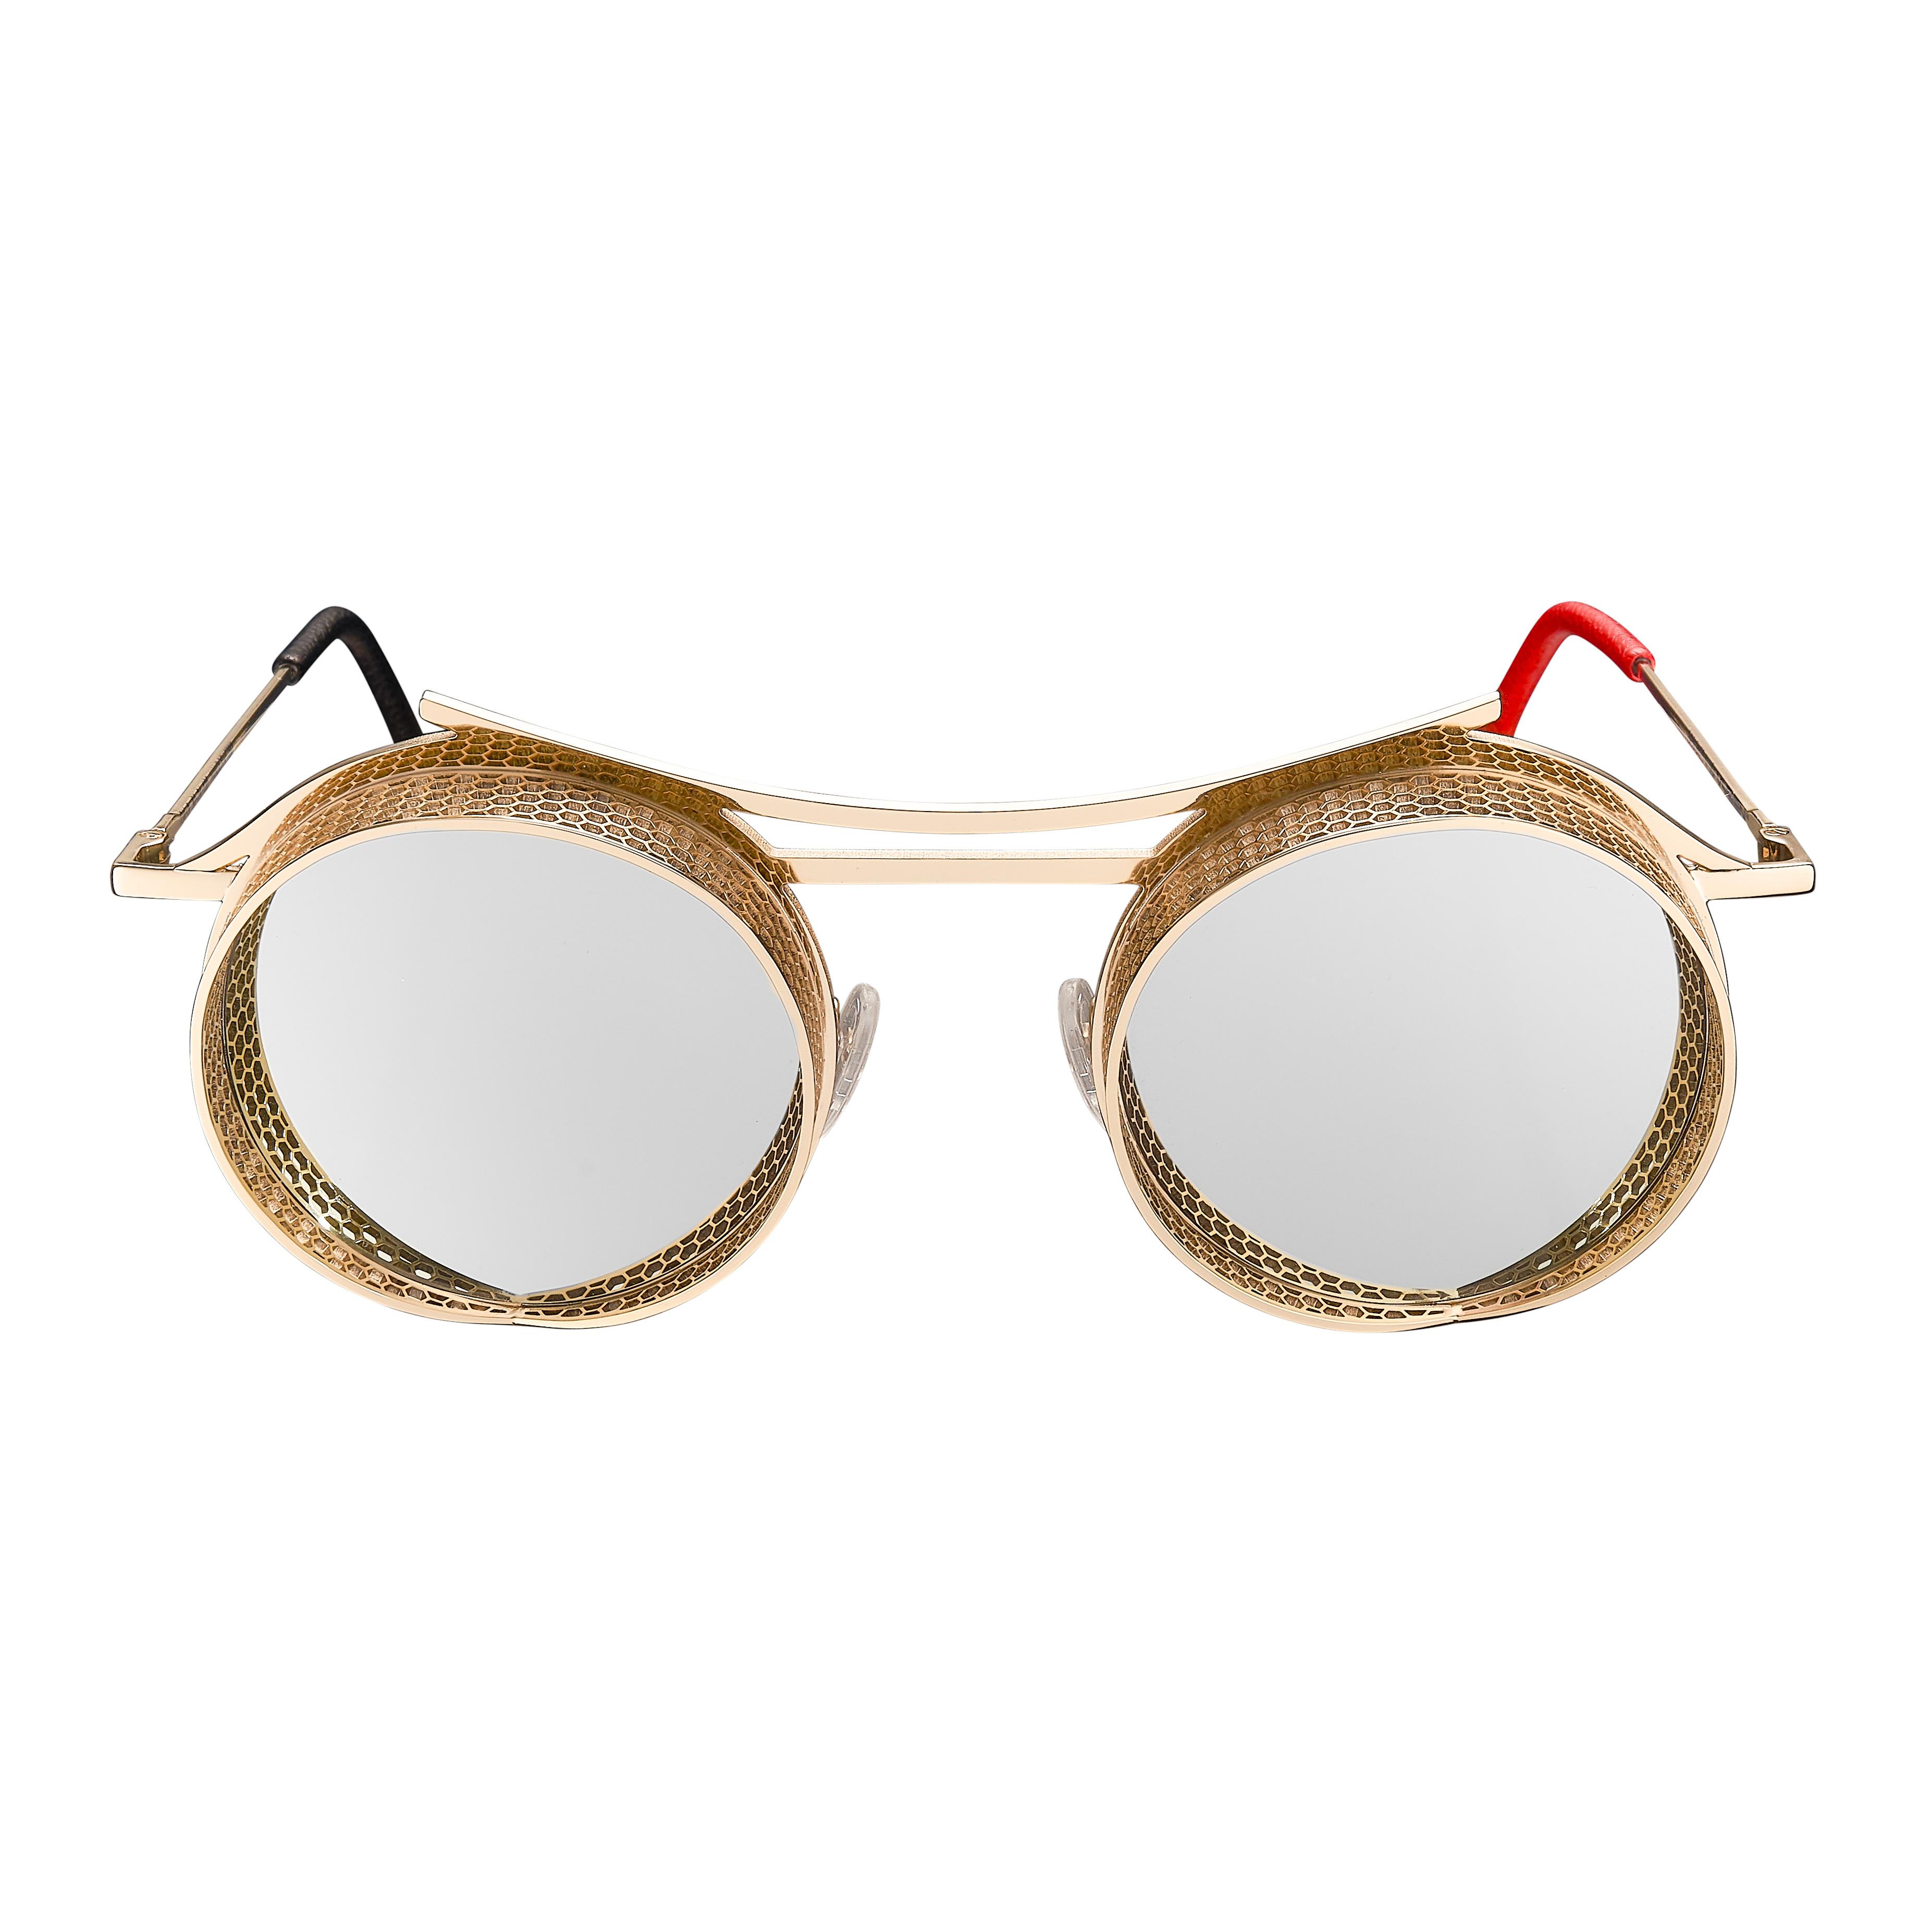 ONIX - OX - 3 - Shiny Gold Frame + Silver Mirror Lenses